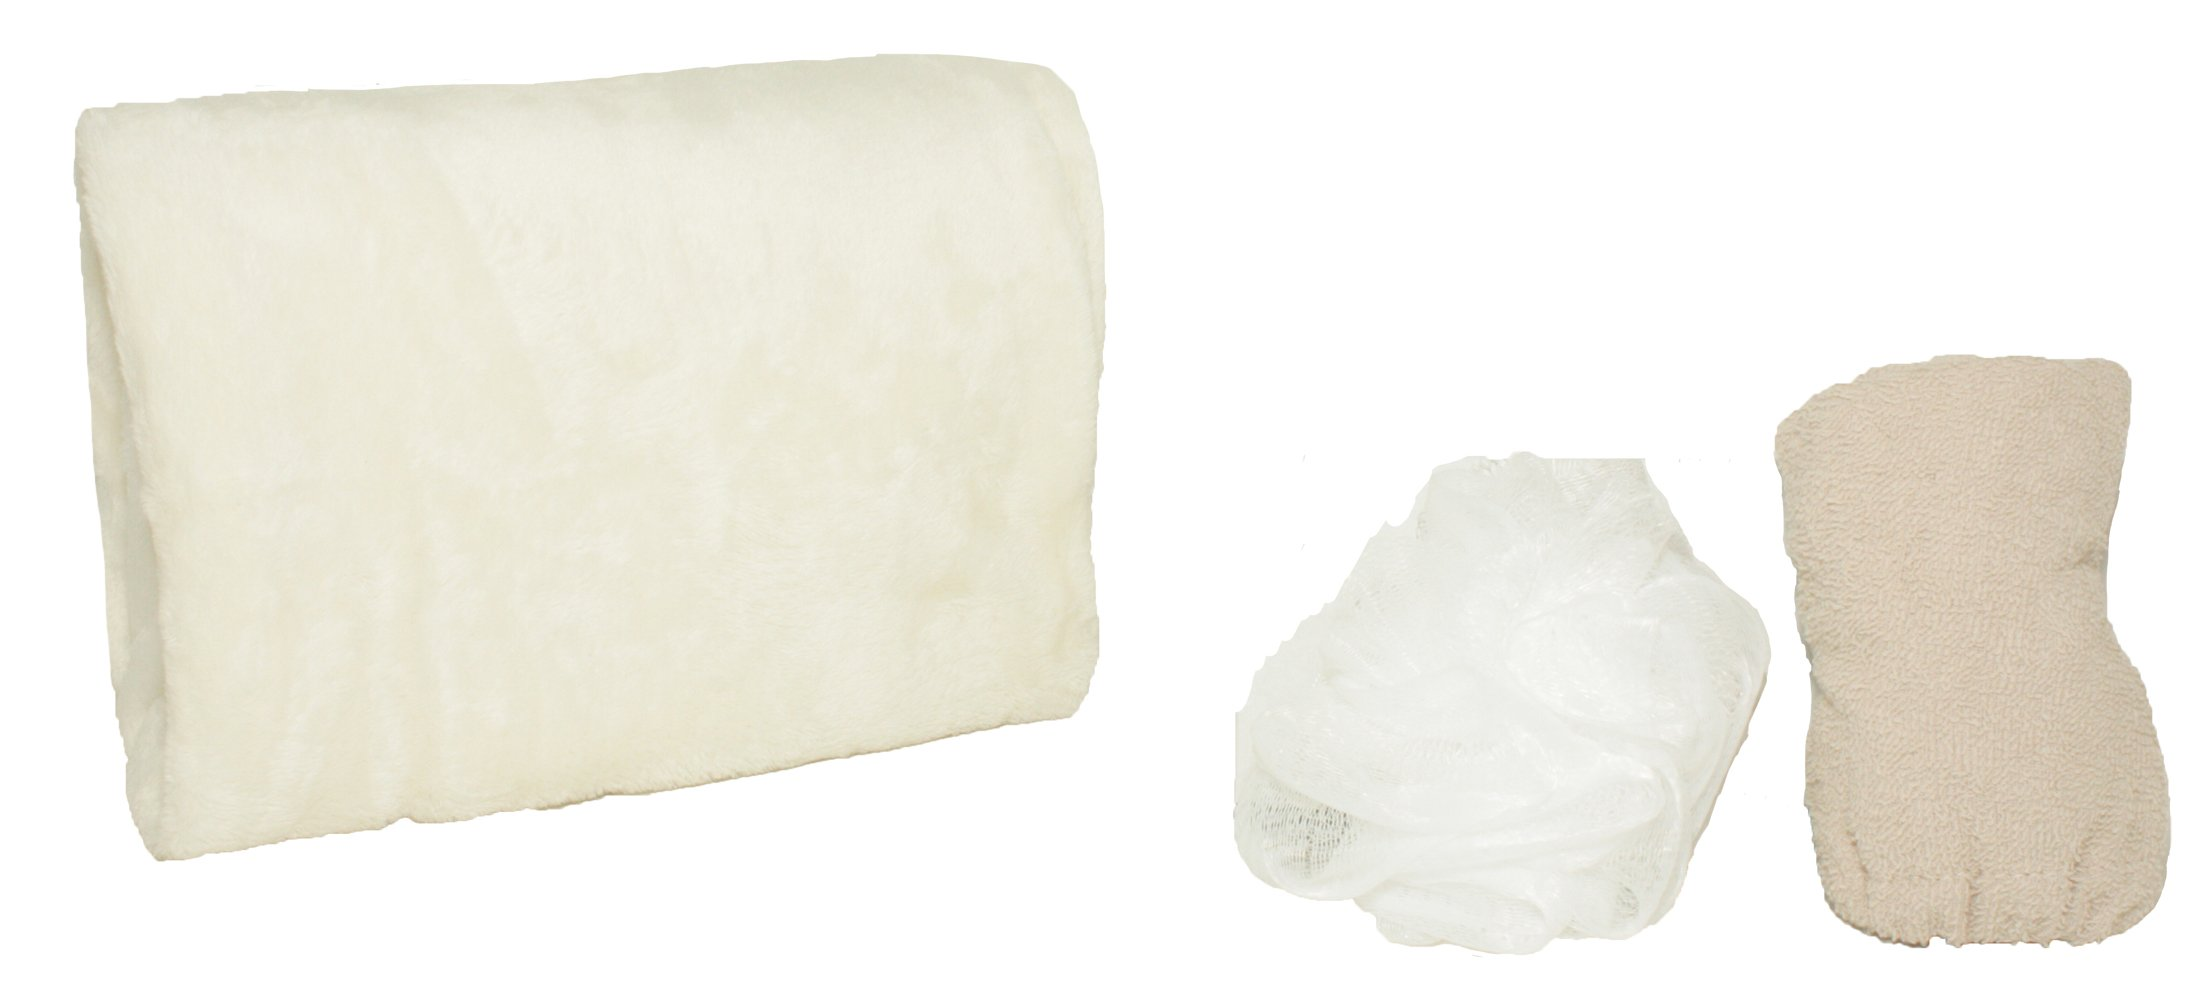 Adrienne Vittadini Women's 3 Piece Bath Body Plush Shower Towel Wrap Spa Set | Bath Body Towel Wrap with Adjustable Fastener, Hair Towel Twist, Loofah/Bath Body Sponge by Adrienne Vittadino (Image #2)